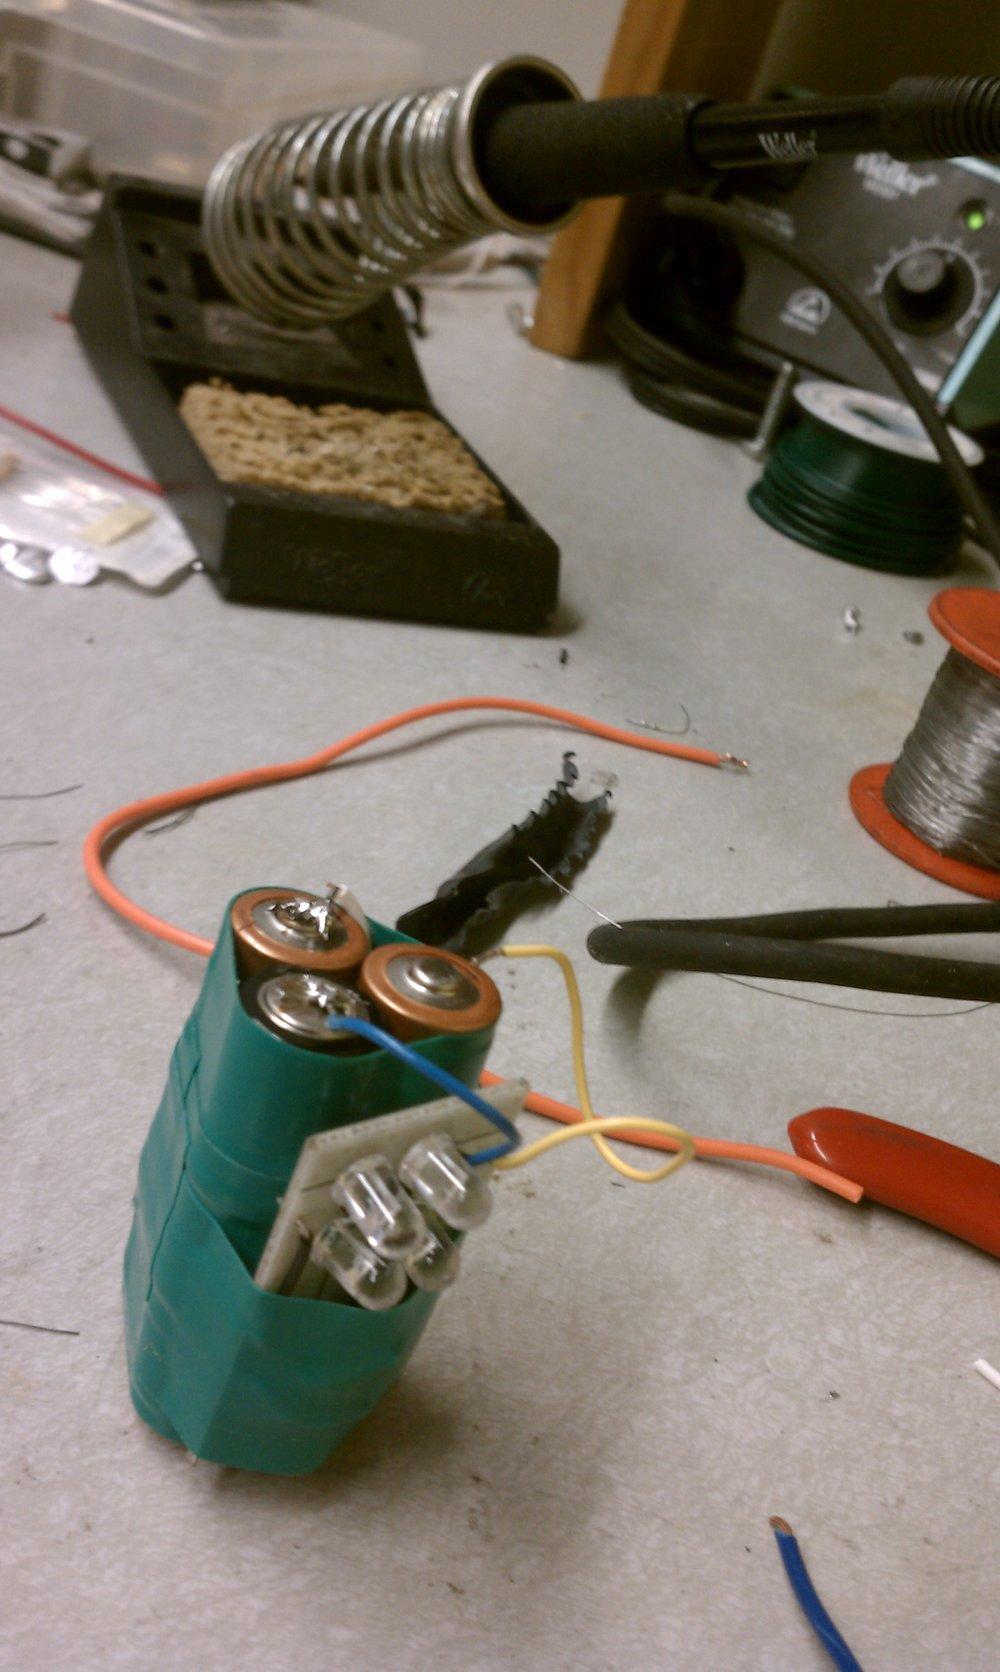 IR Transmitter Prototype